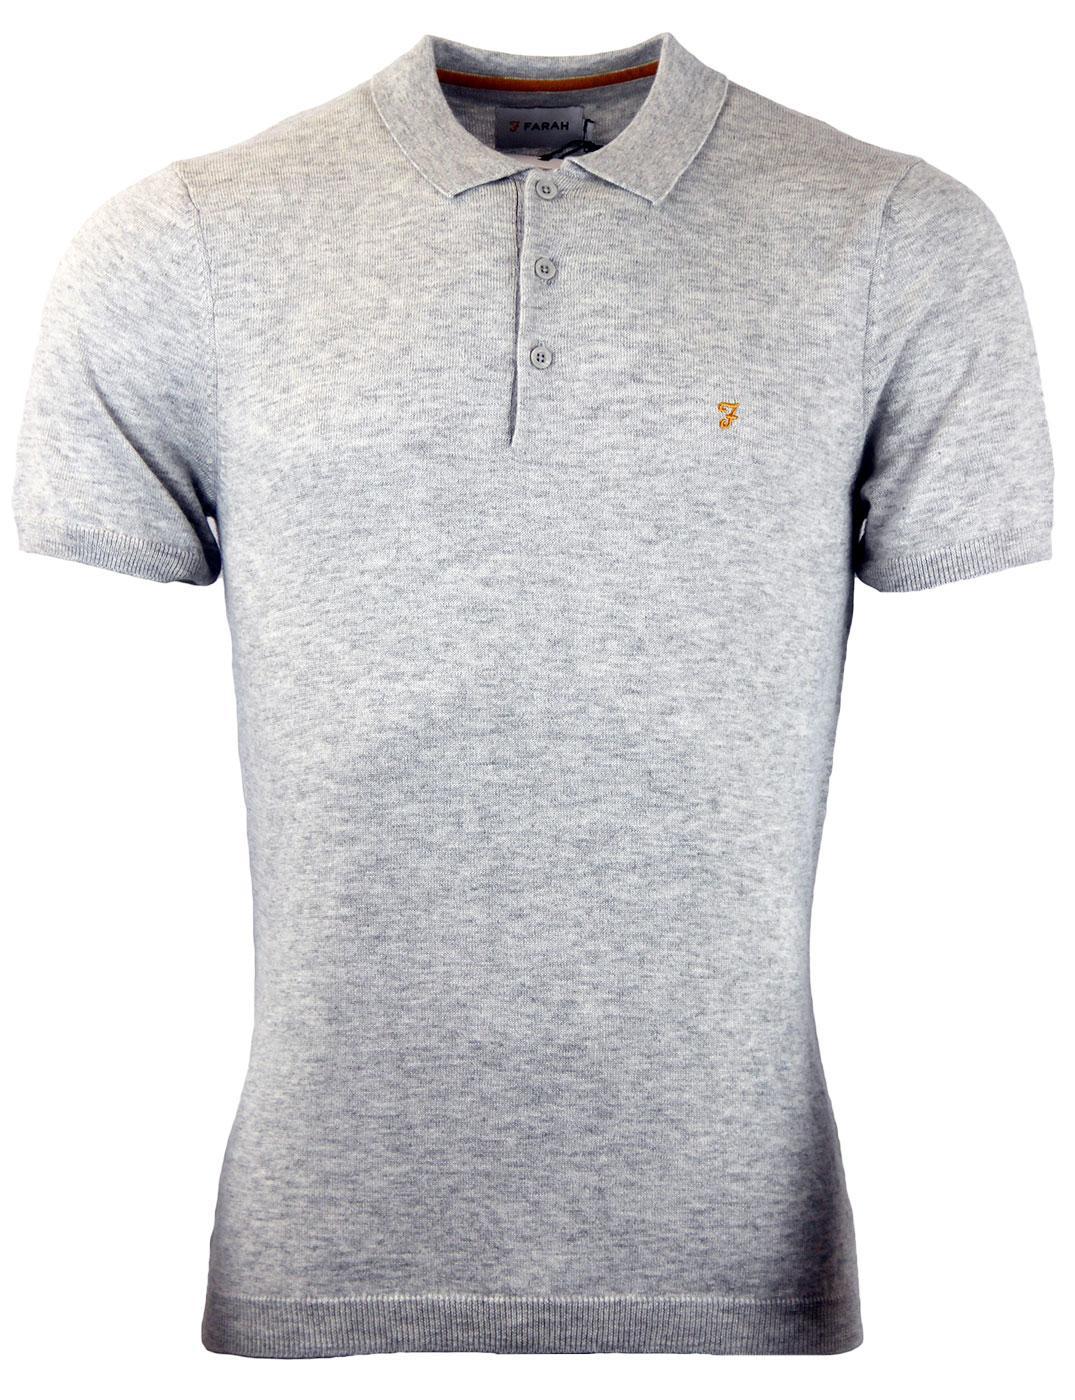 The Affrey FARAH Retro Mod Knitted Polo Shirt (LG)